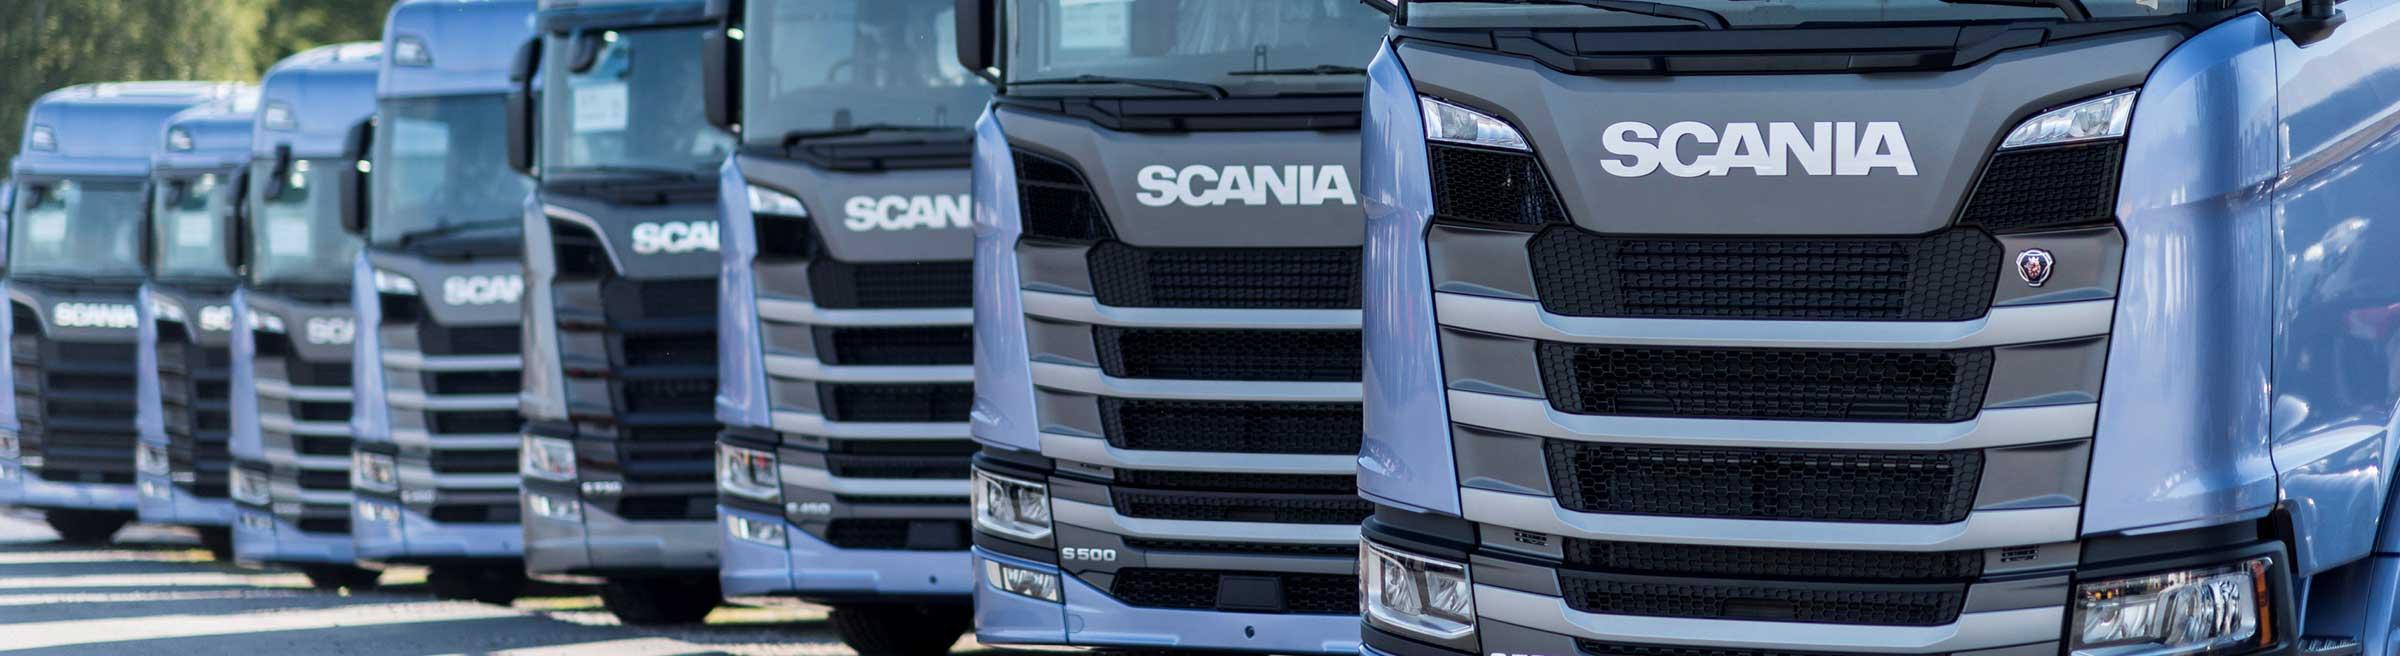 Nyleveranser Scania hos Toveks Lastbilar